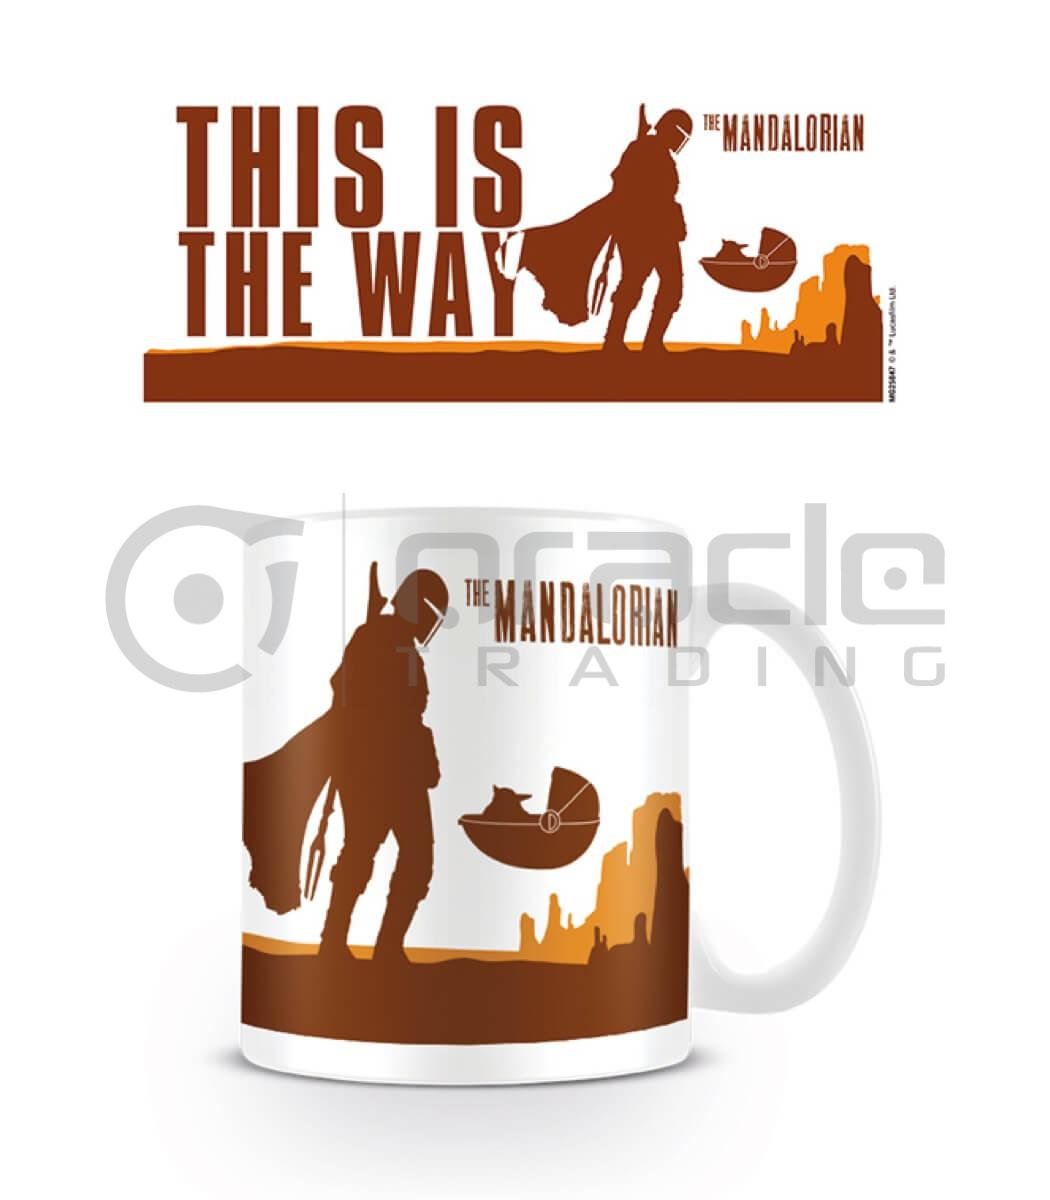 Star Wars: The Mandalorian This is the Way Mug